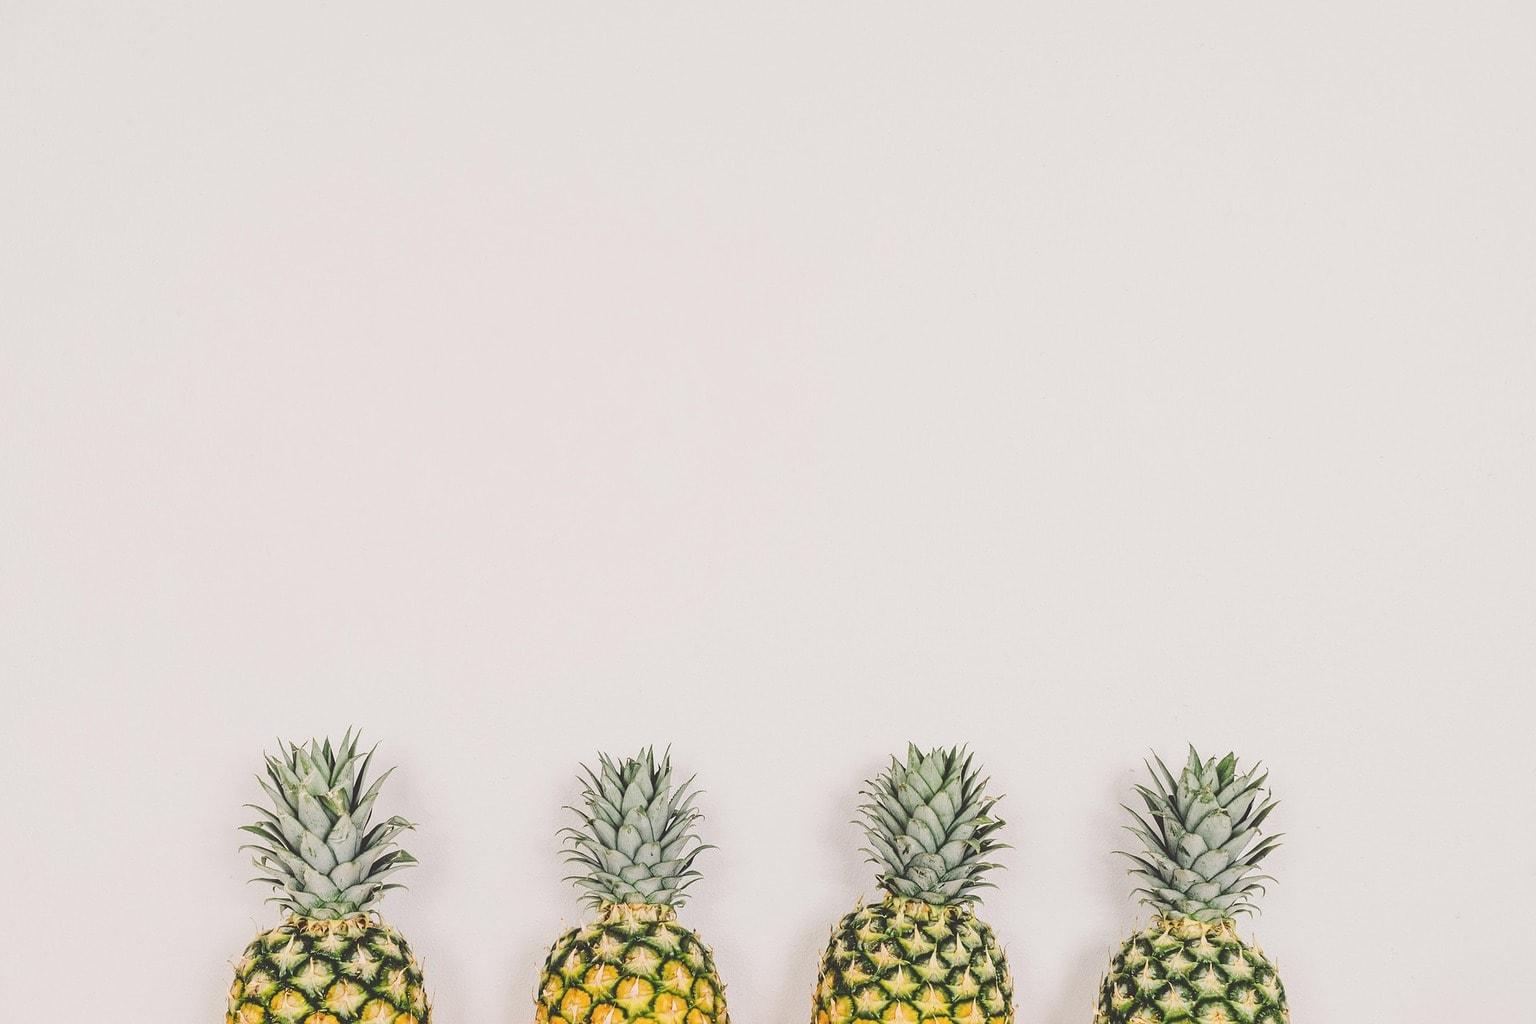 pineapples-1606852_1920-1